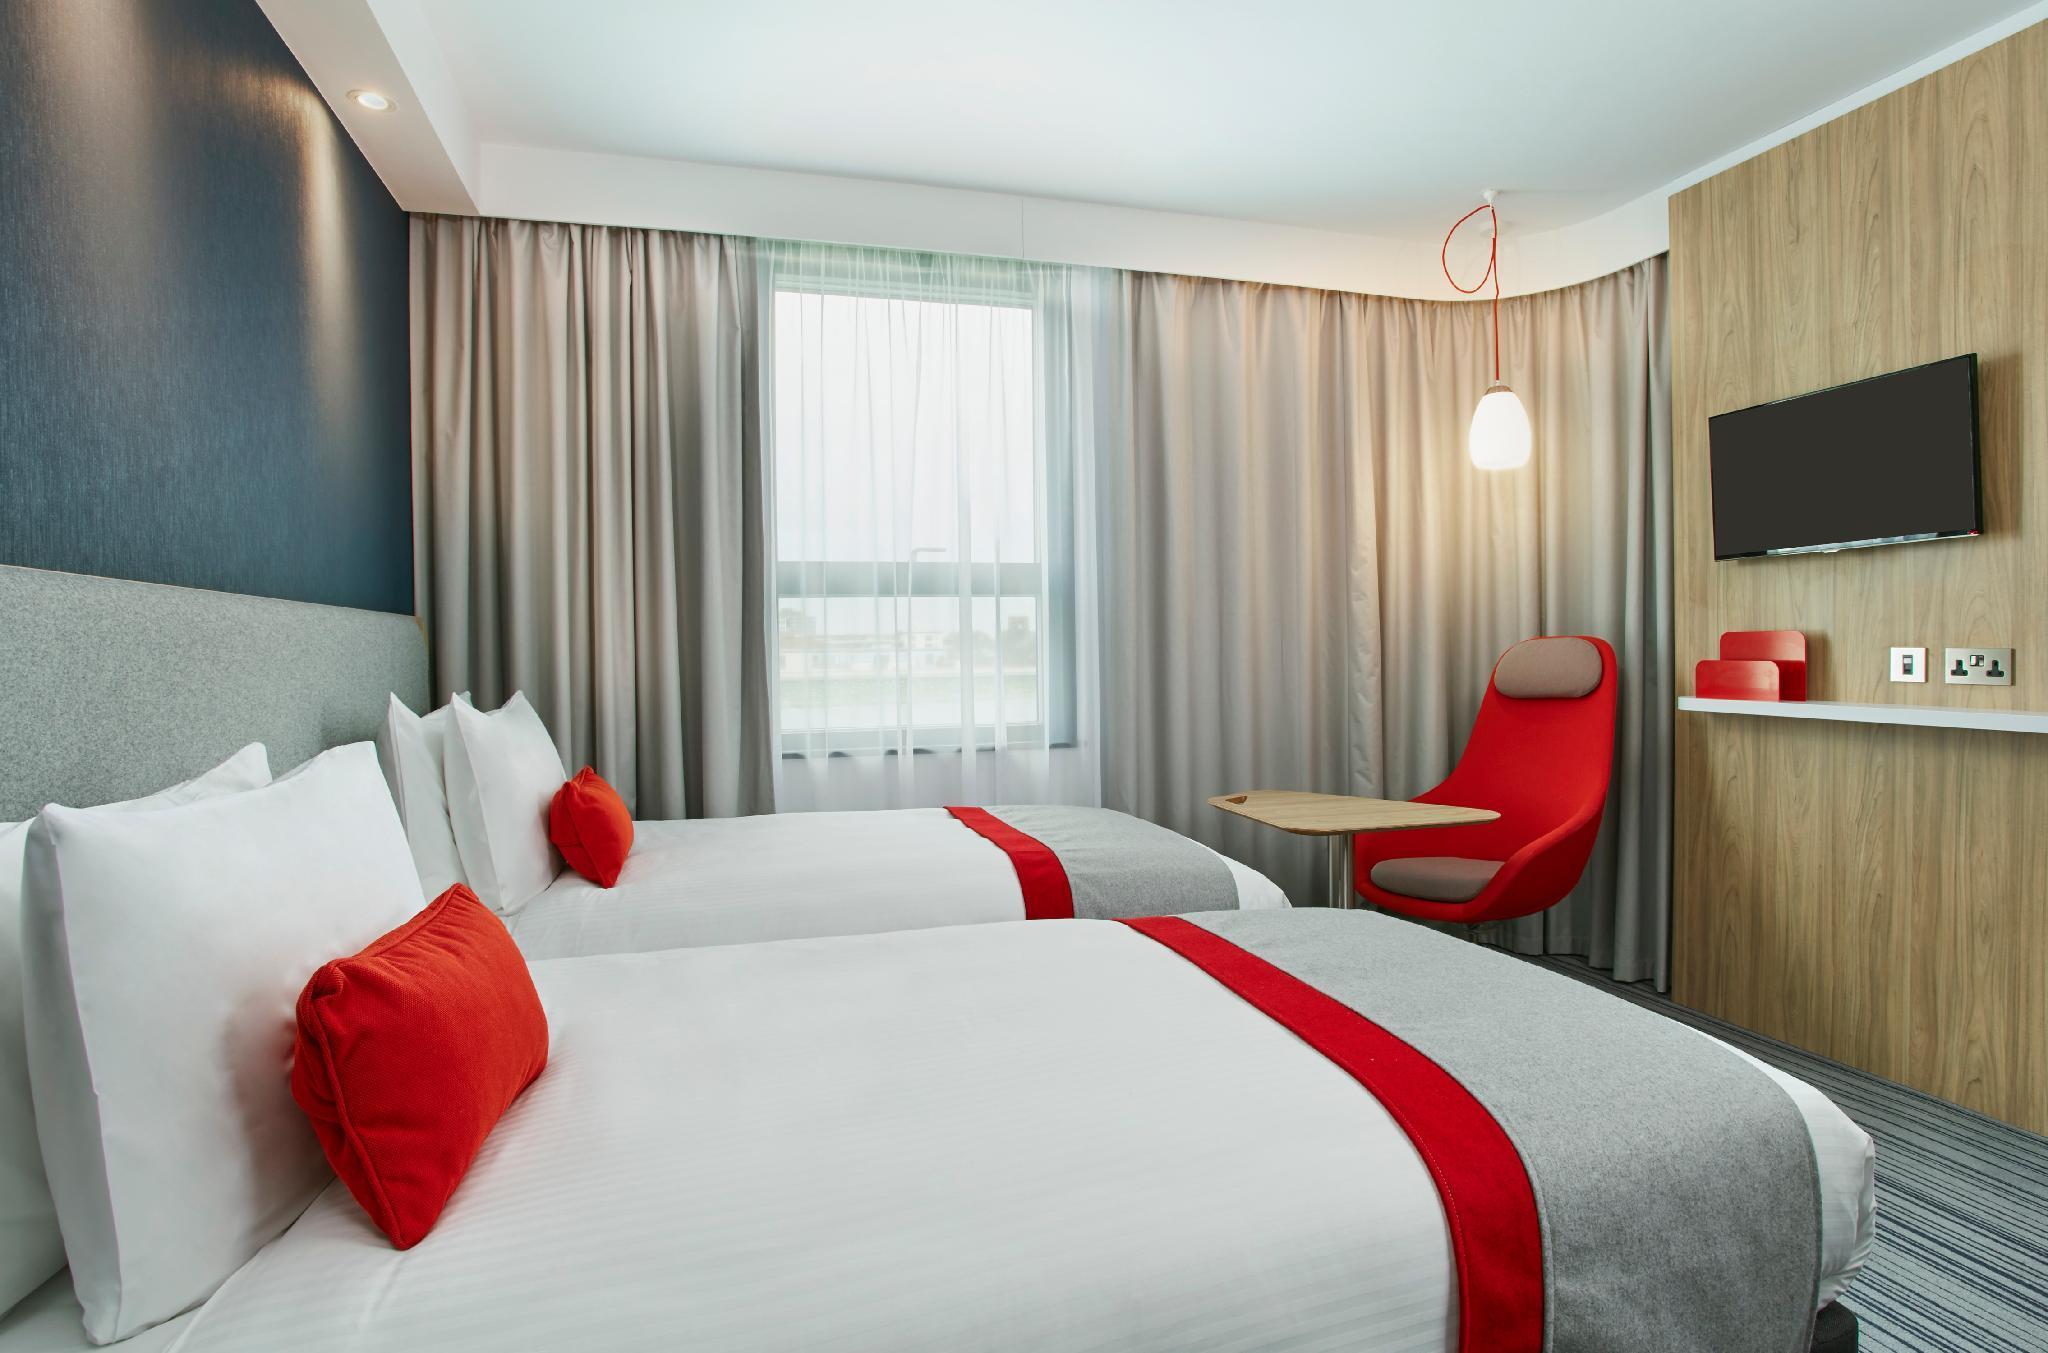 Holiday Inn Express Rouen Sud